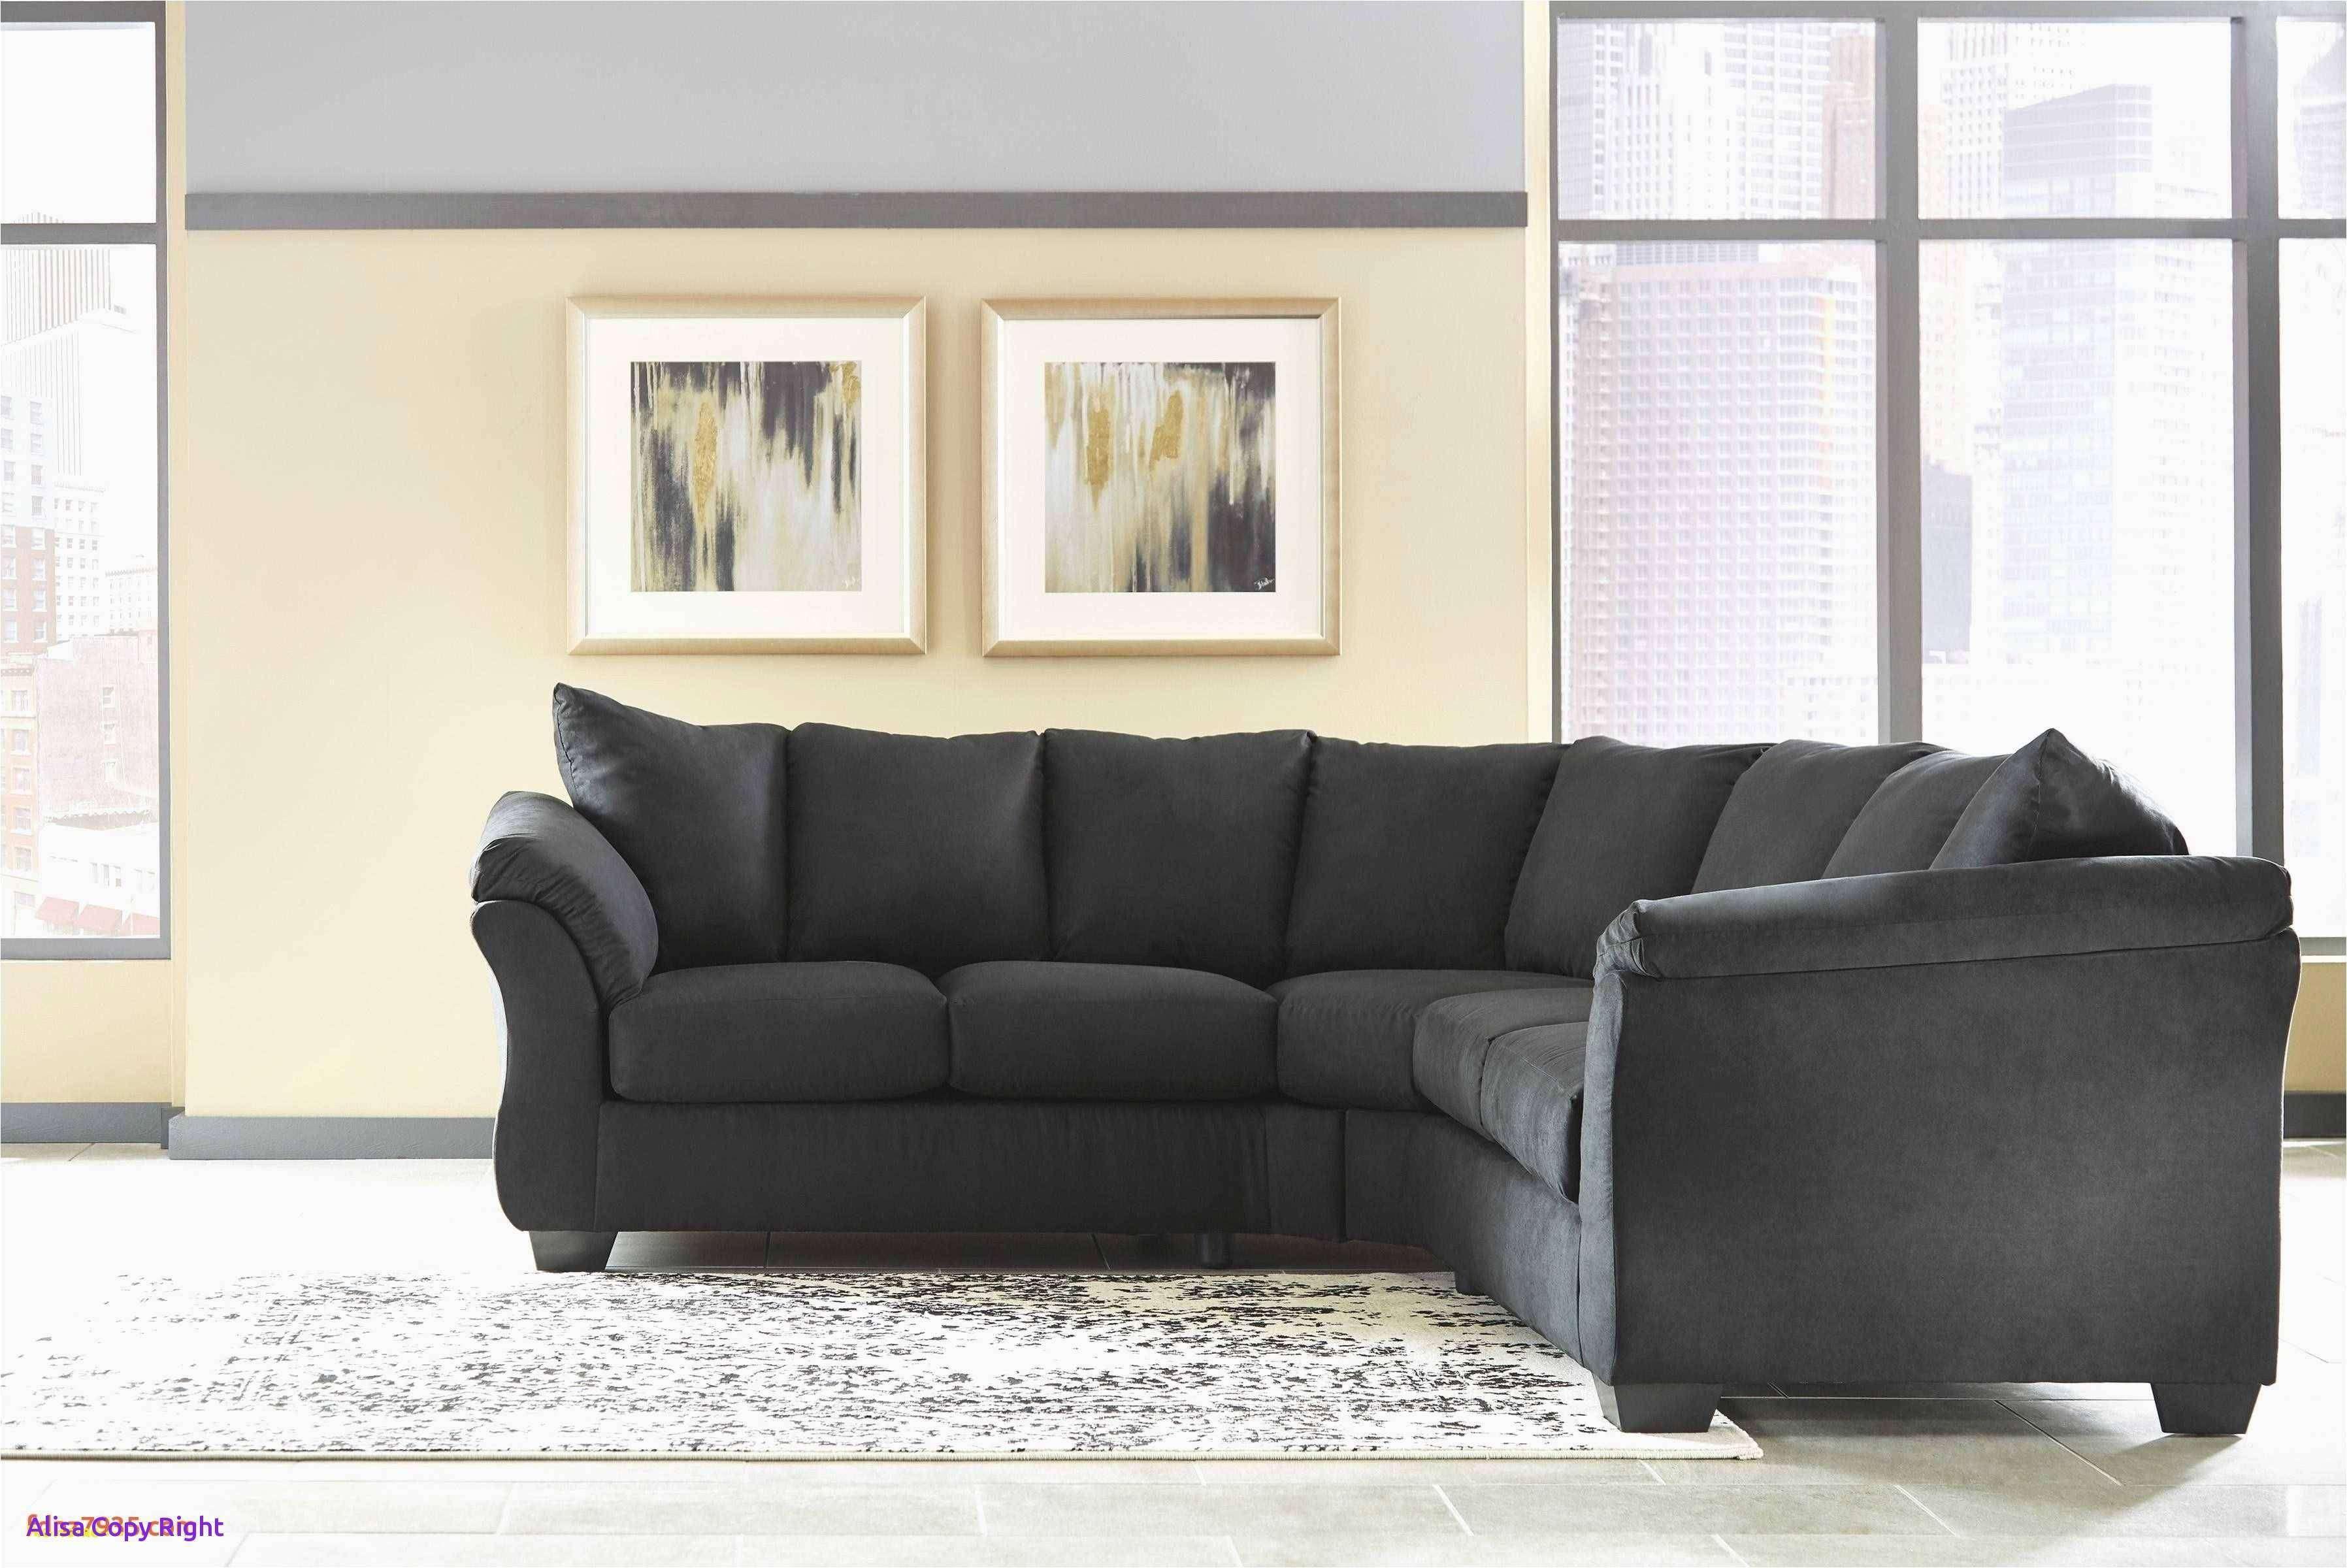 Ifuns China Export Modern Design L Shape Sectional Sofa Set Living Room Furniture Corner Chais With Images Living Room Sofa Design Living Room Sofa Set Modern Sofa Designs